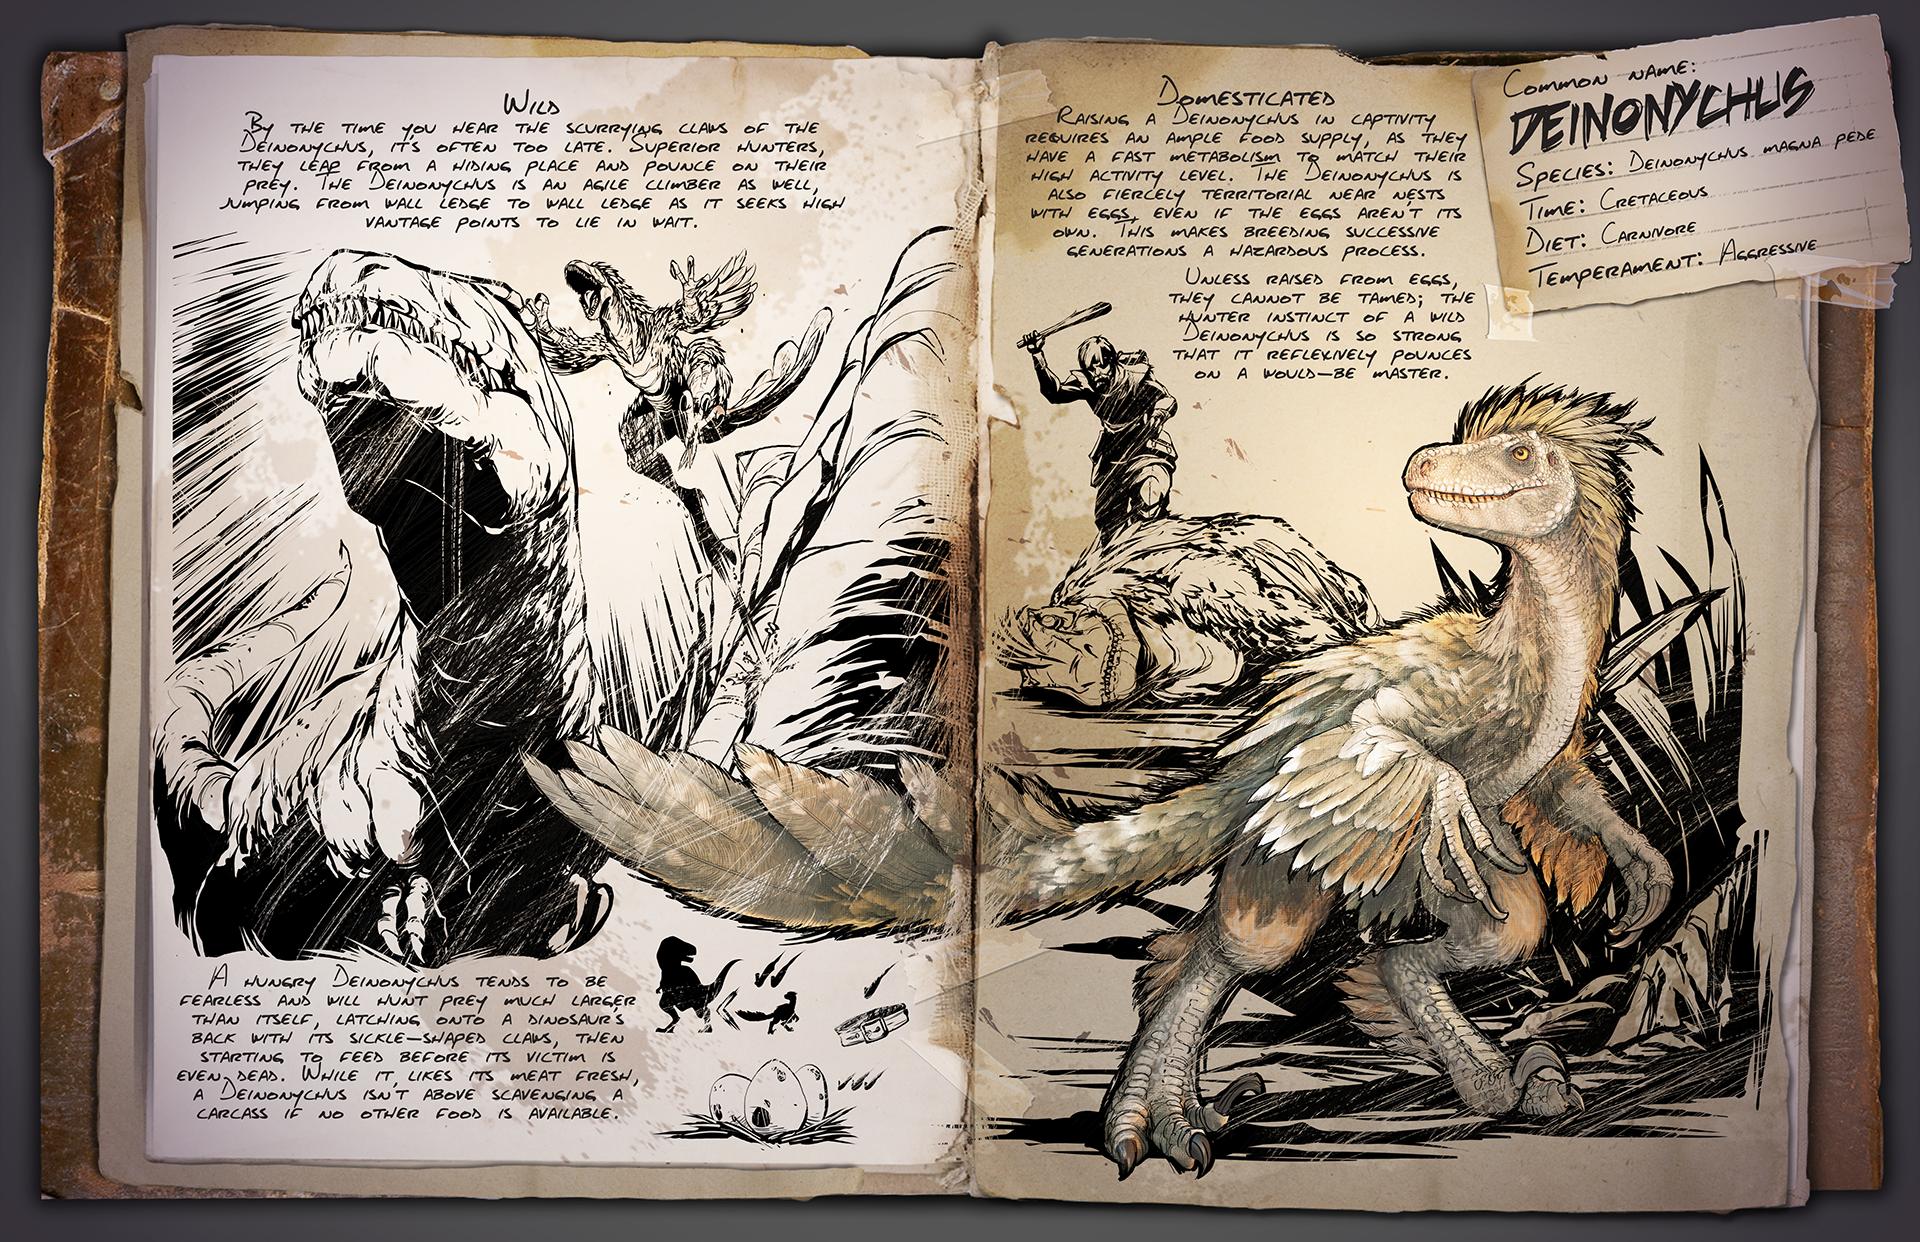 Dino Dossier: Deinonychus